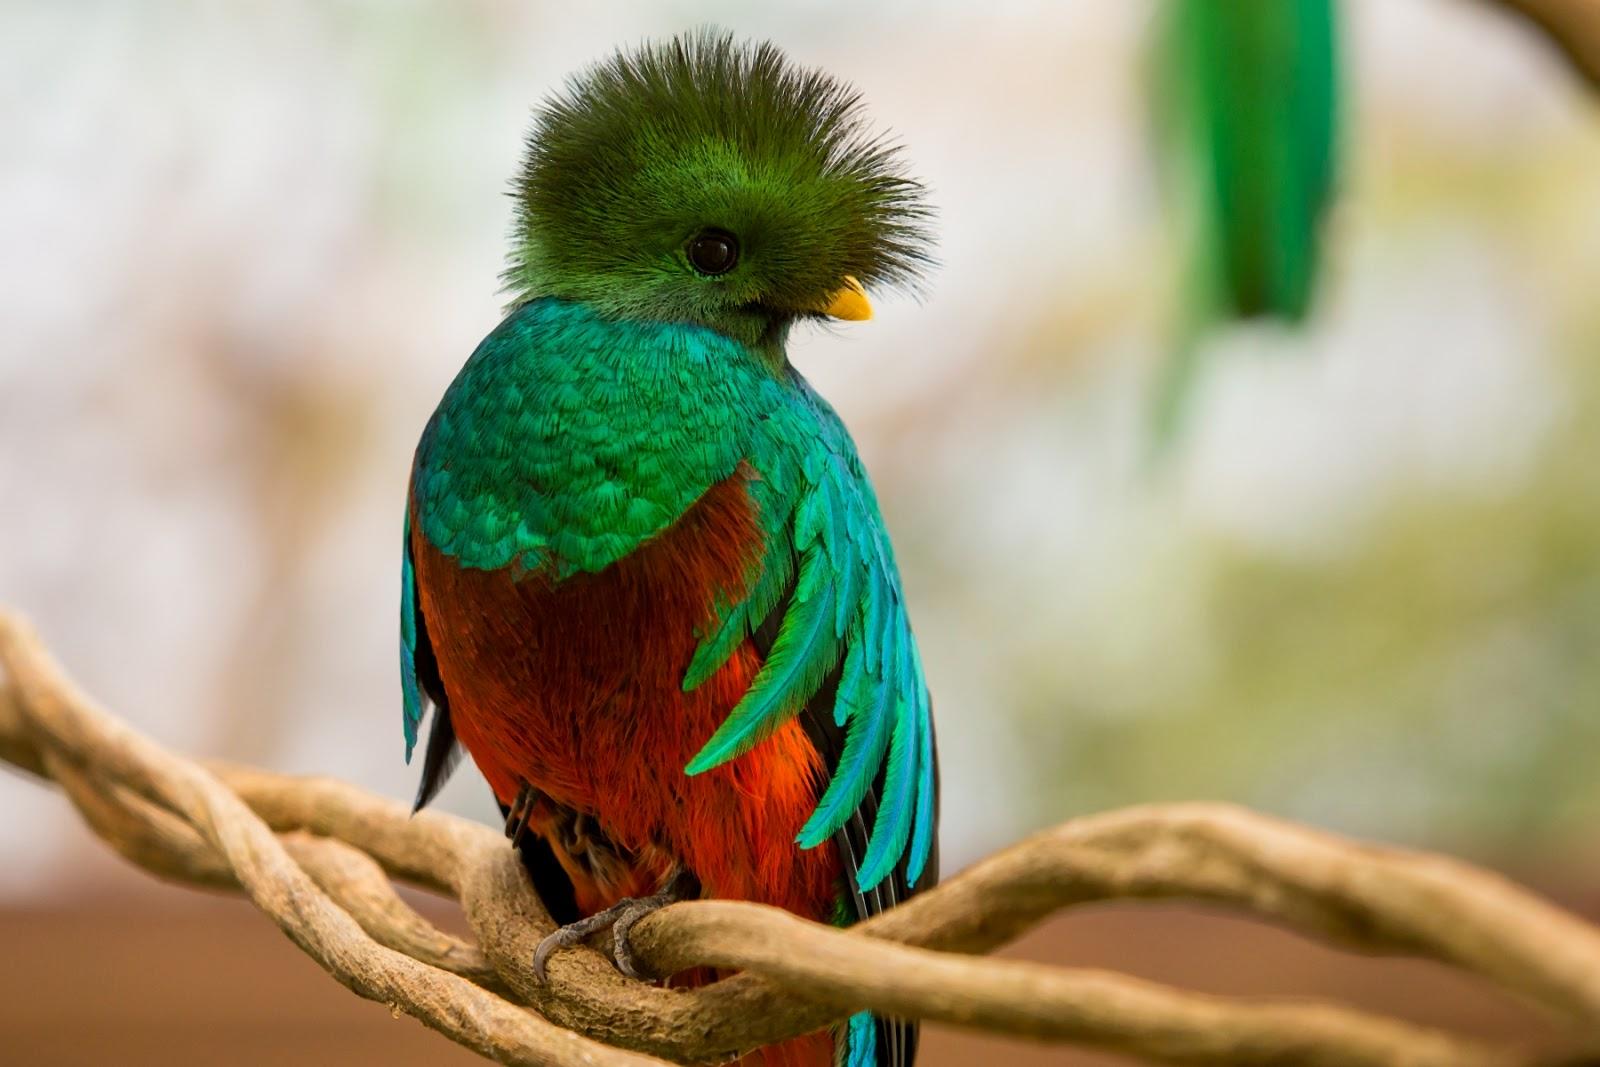 gambar burung Quetzal nama hewan dari huruf Q